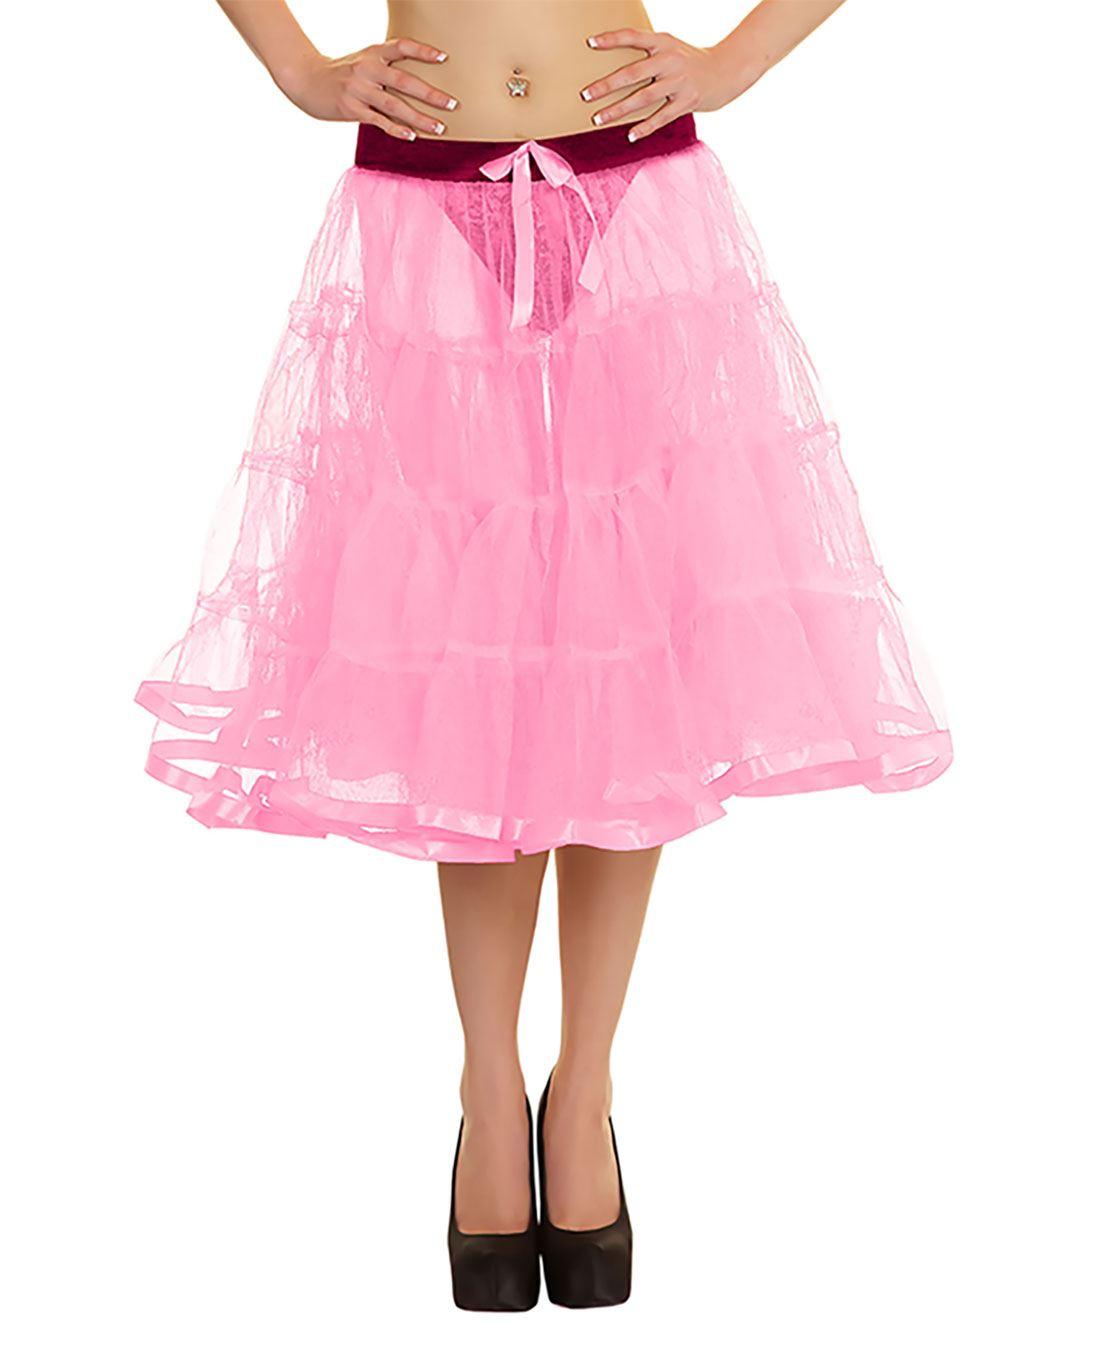 Womens 4 Tier Petticoat With Ribbon Tutu Skirt Ladies Dance Wear Fancy Skirt